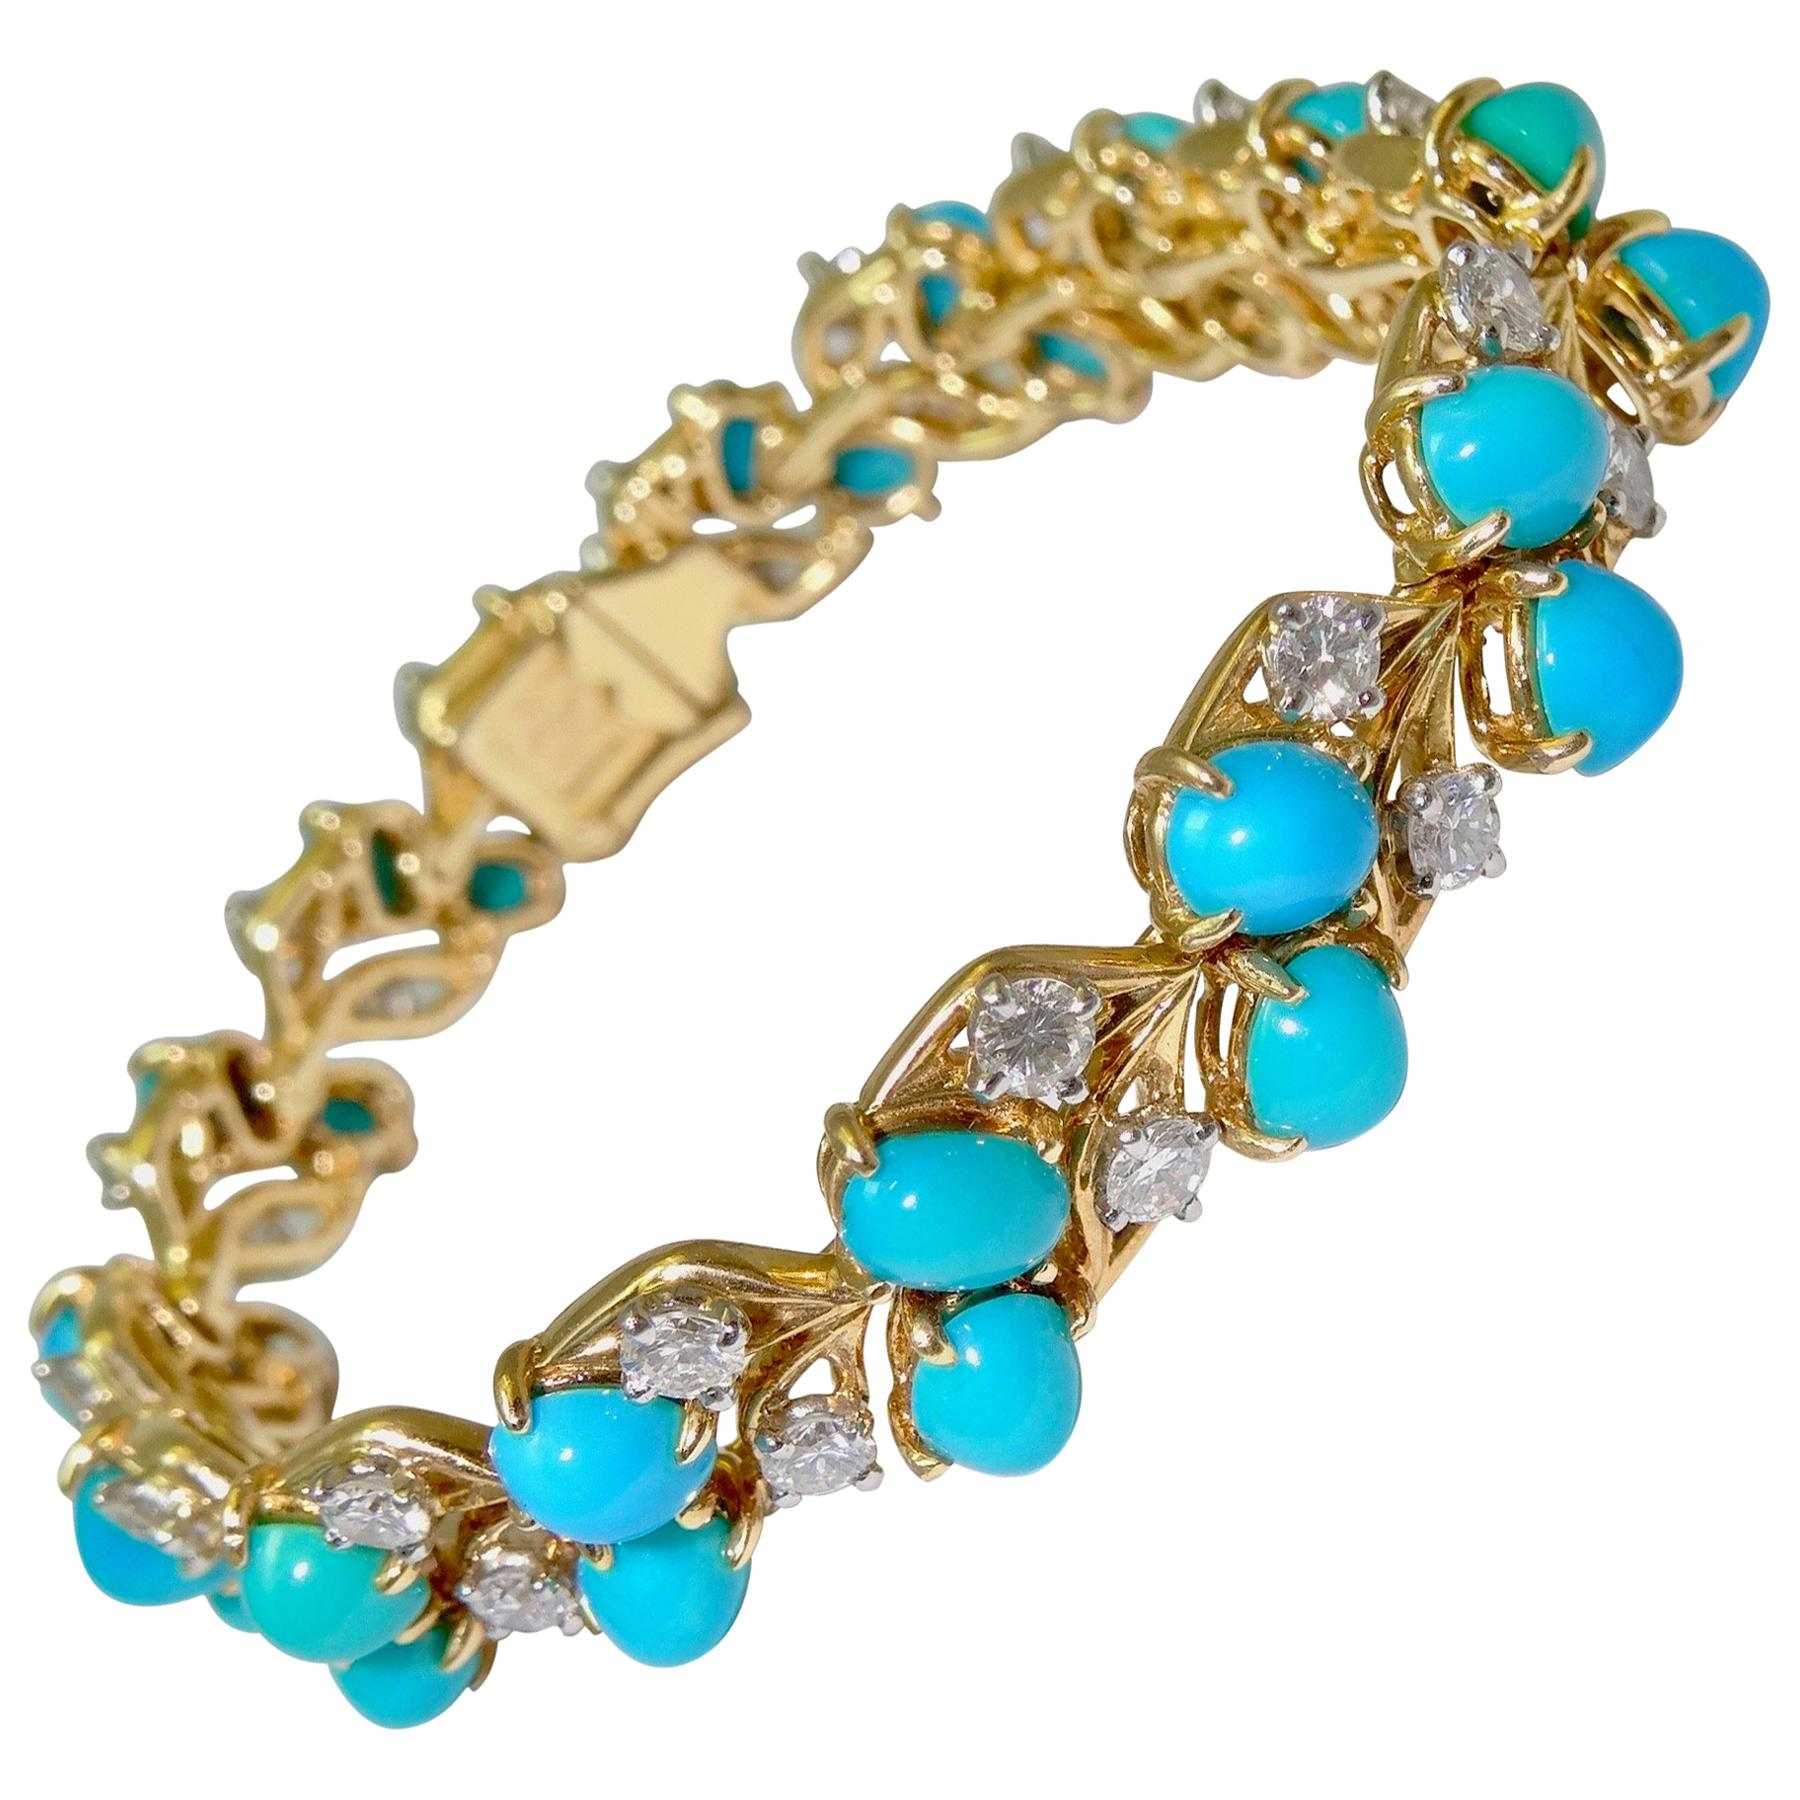 Cartier Diamonds and Turquoises Bracelet